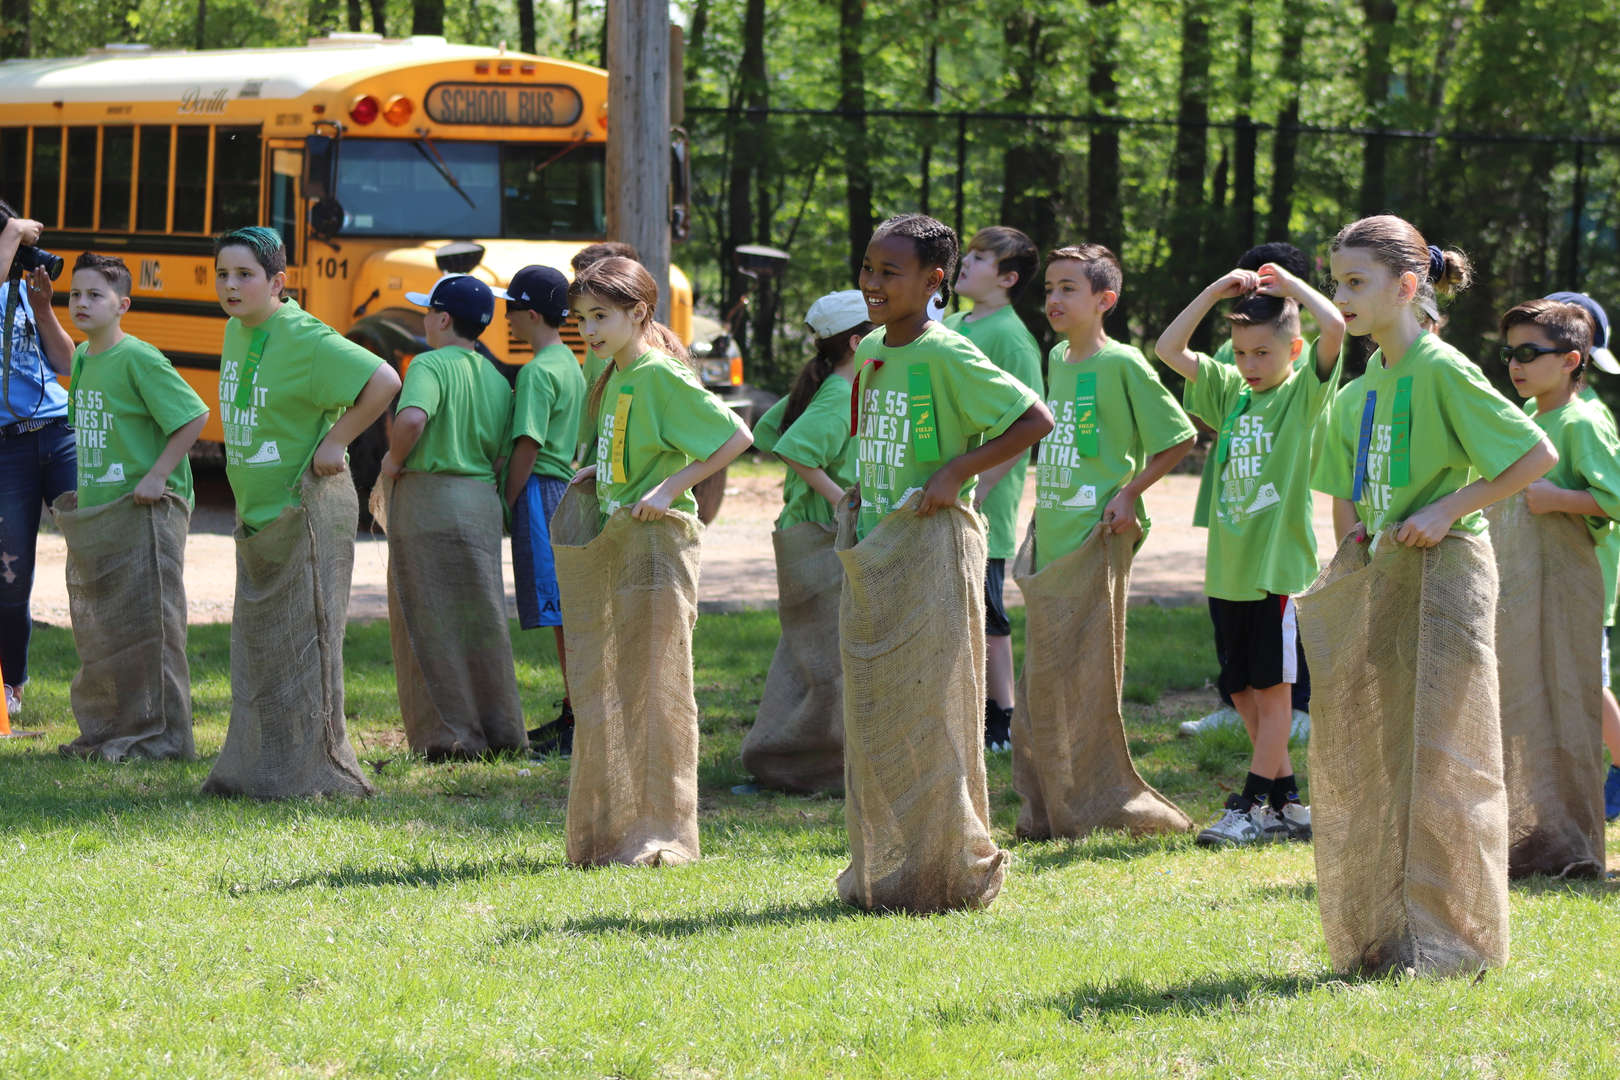 children in a sack race